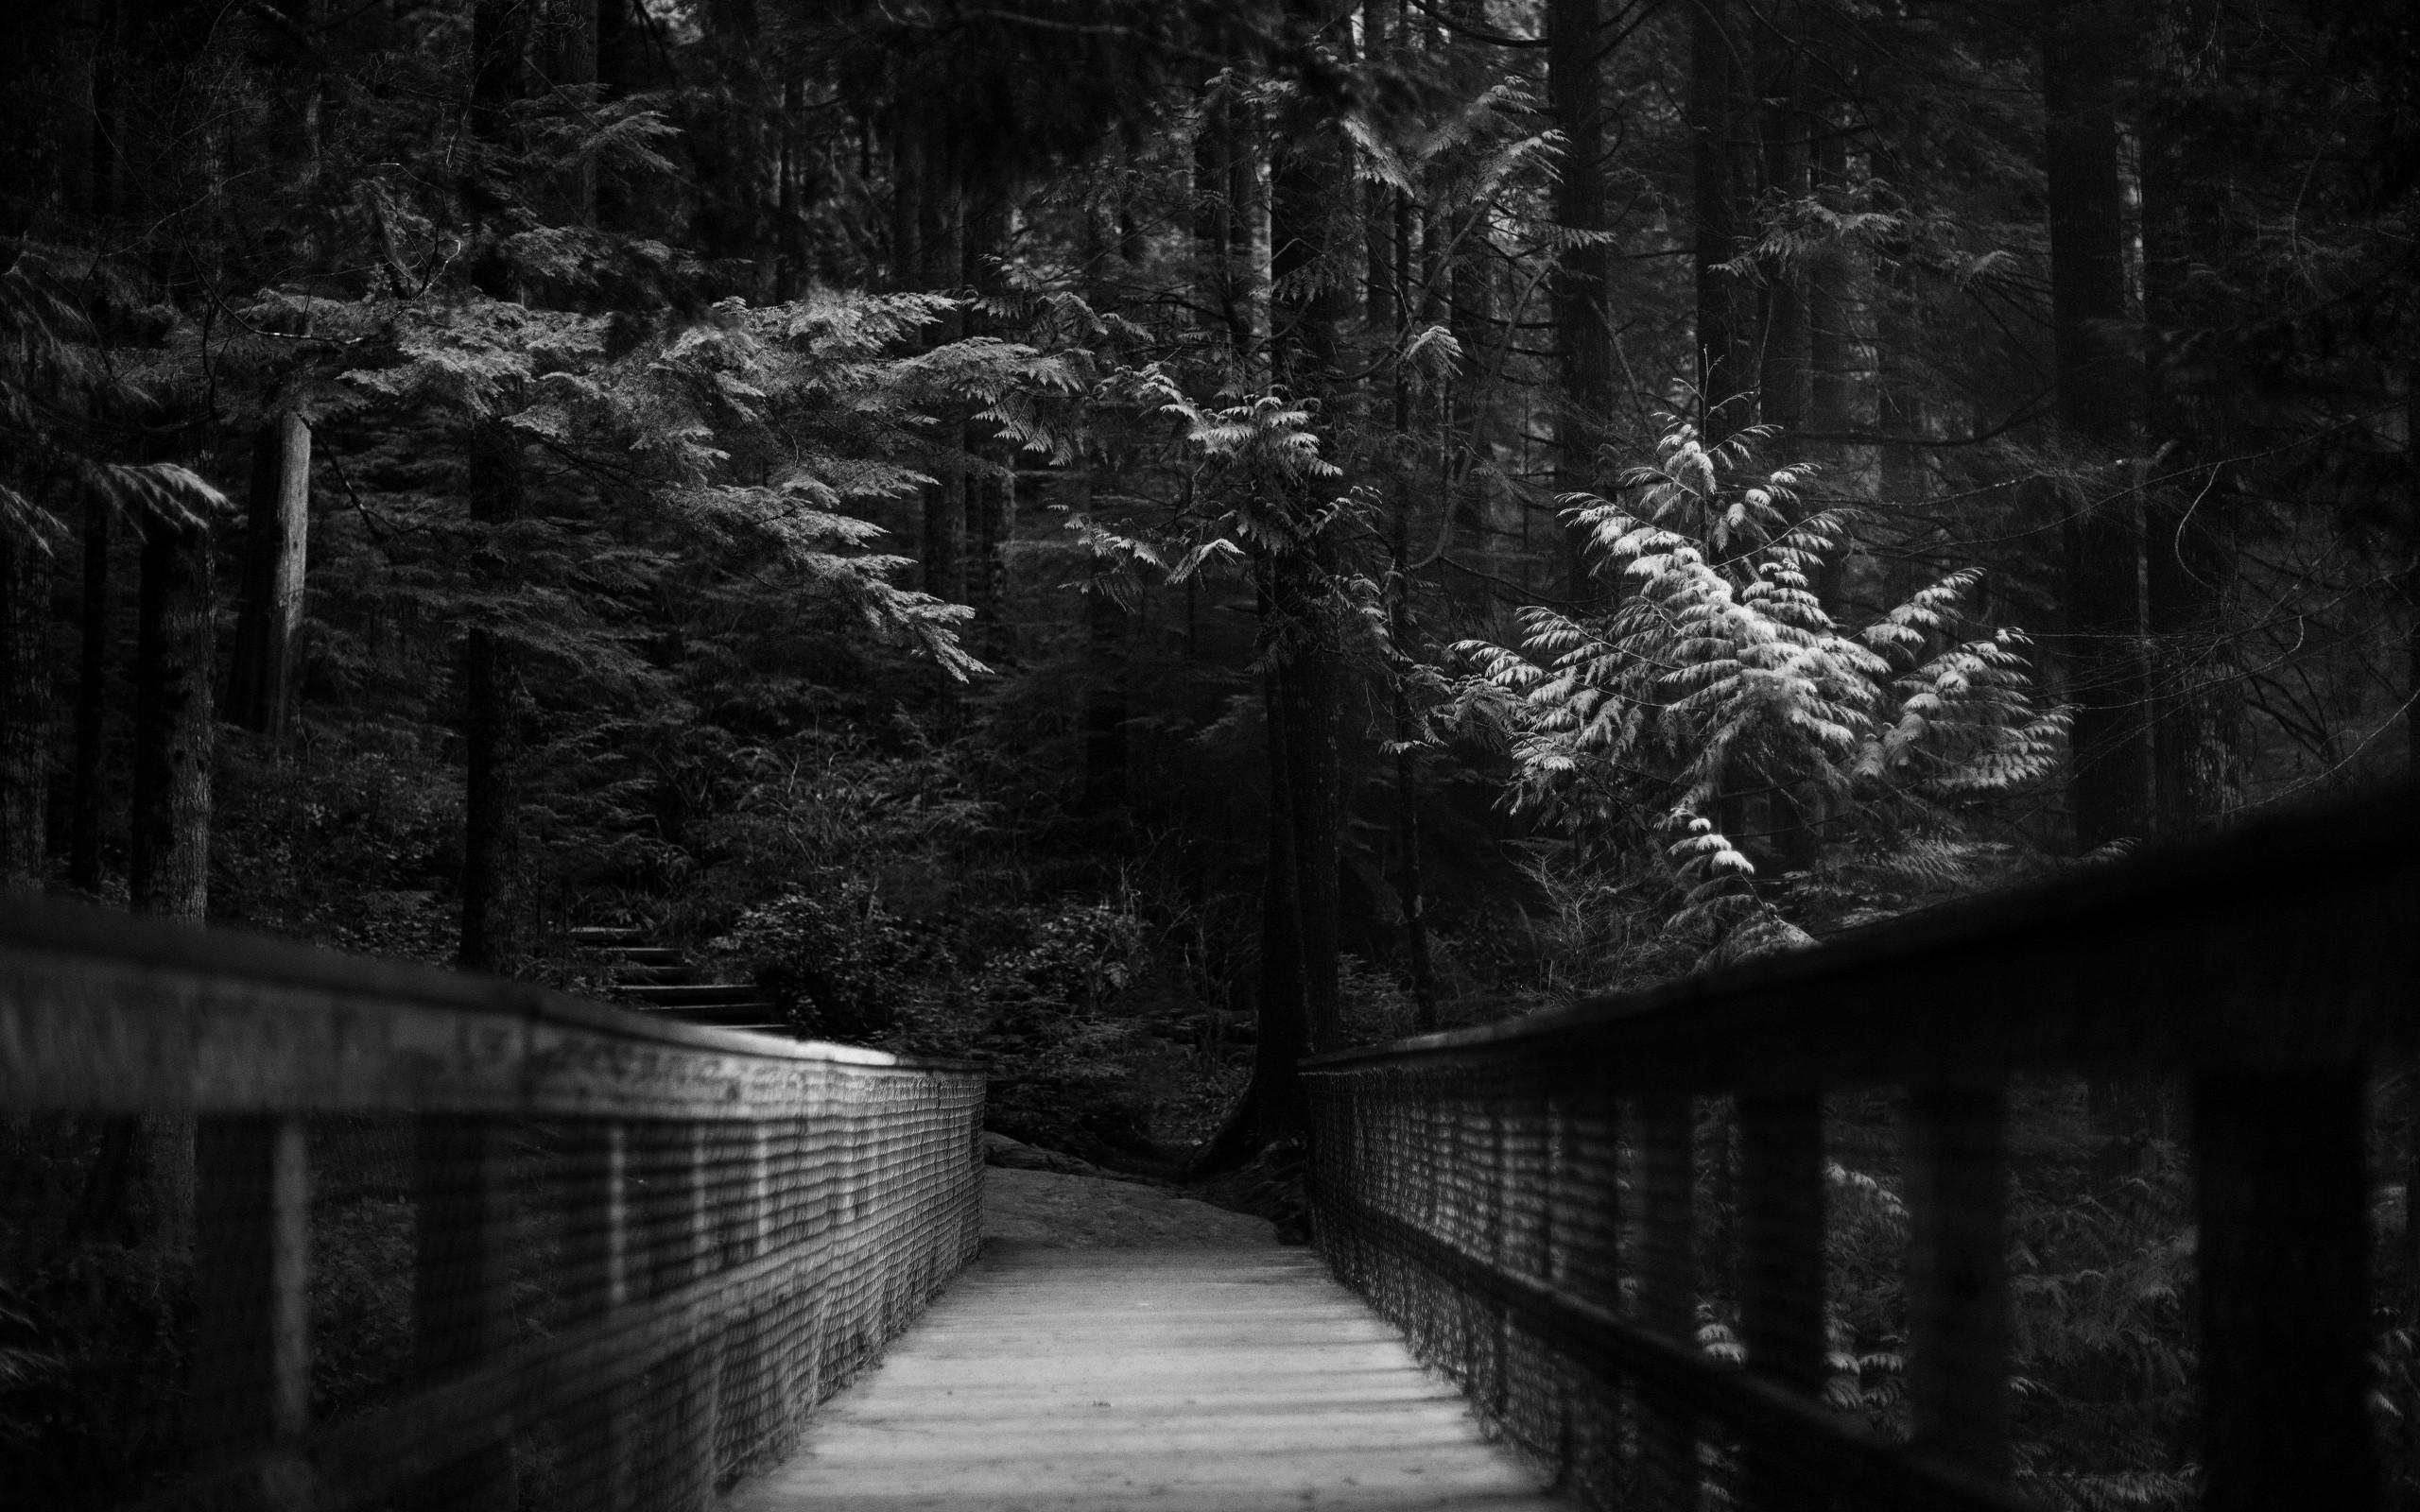 Trees Dark Forest Path Monochrome Wallpaper X  Wallpaperup